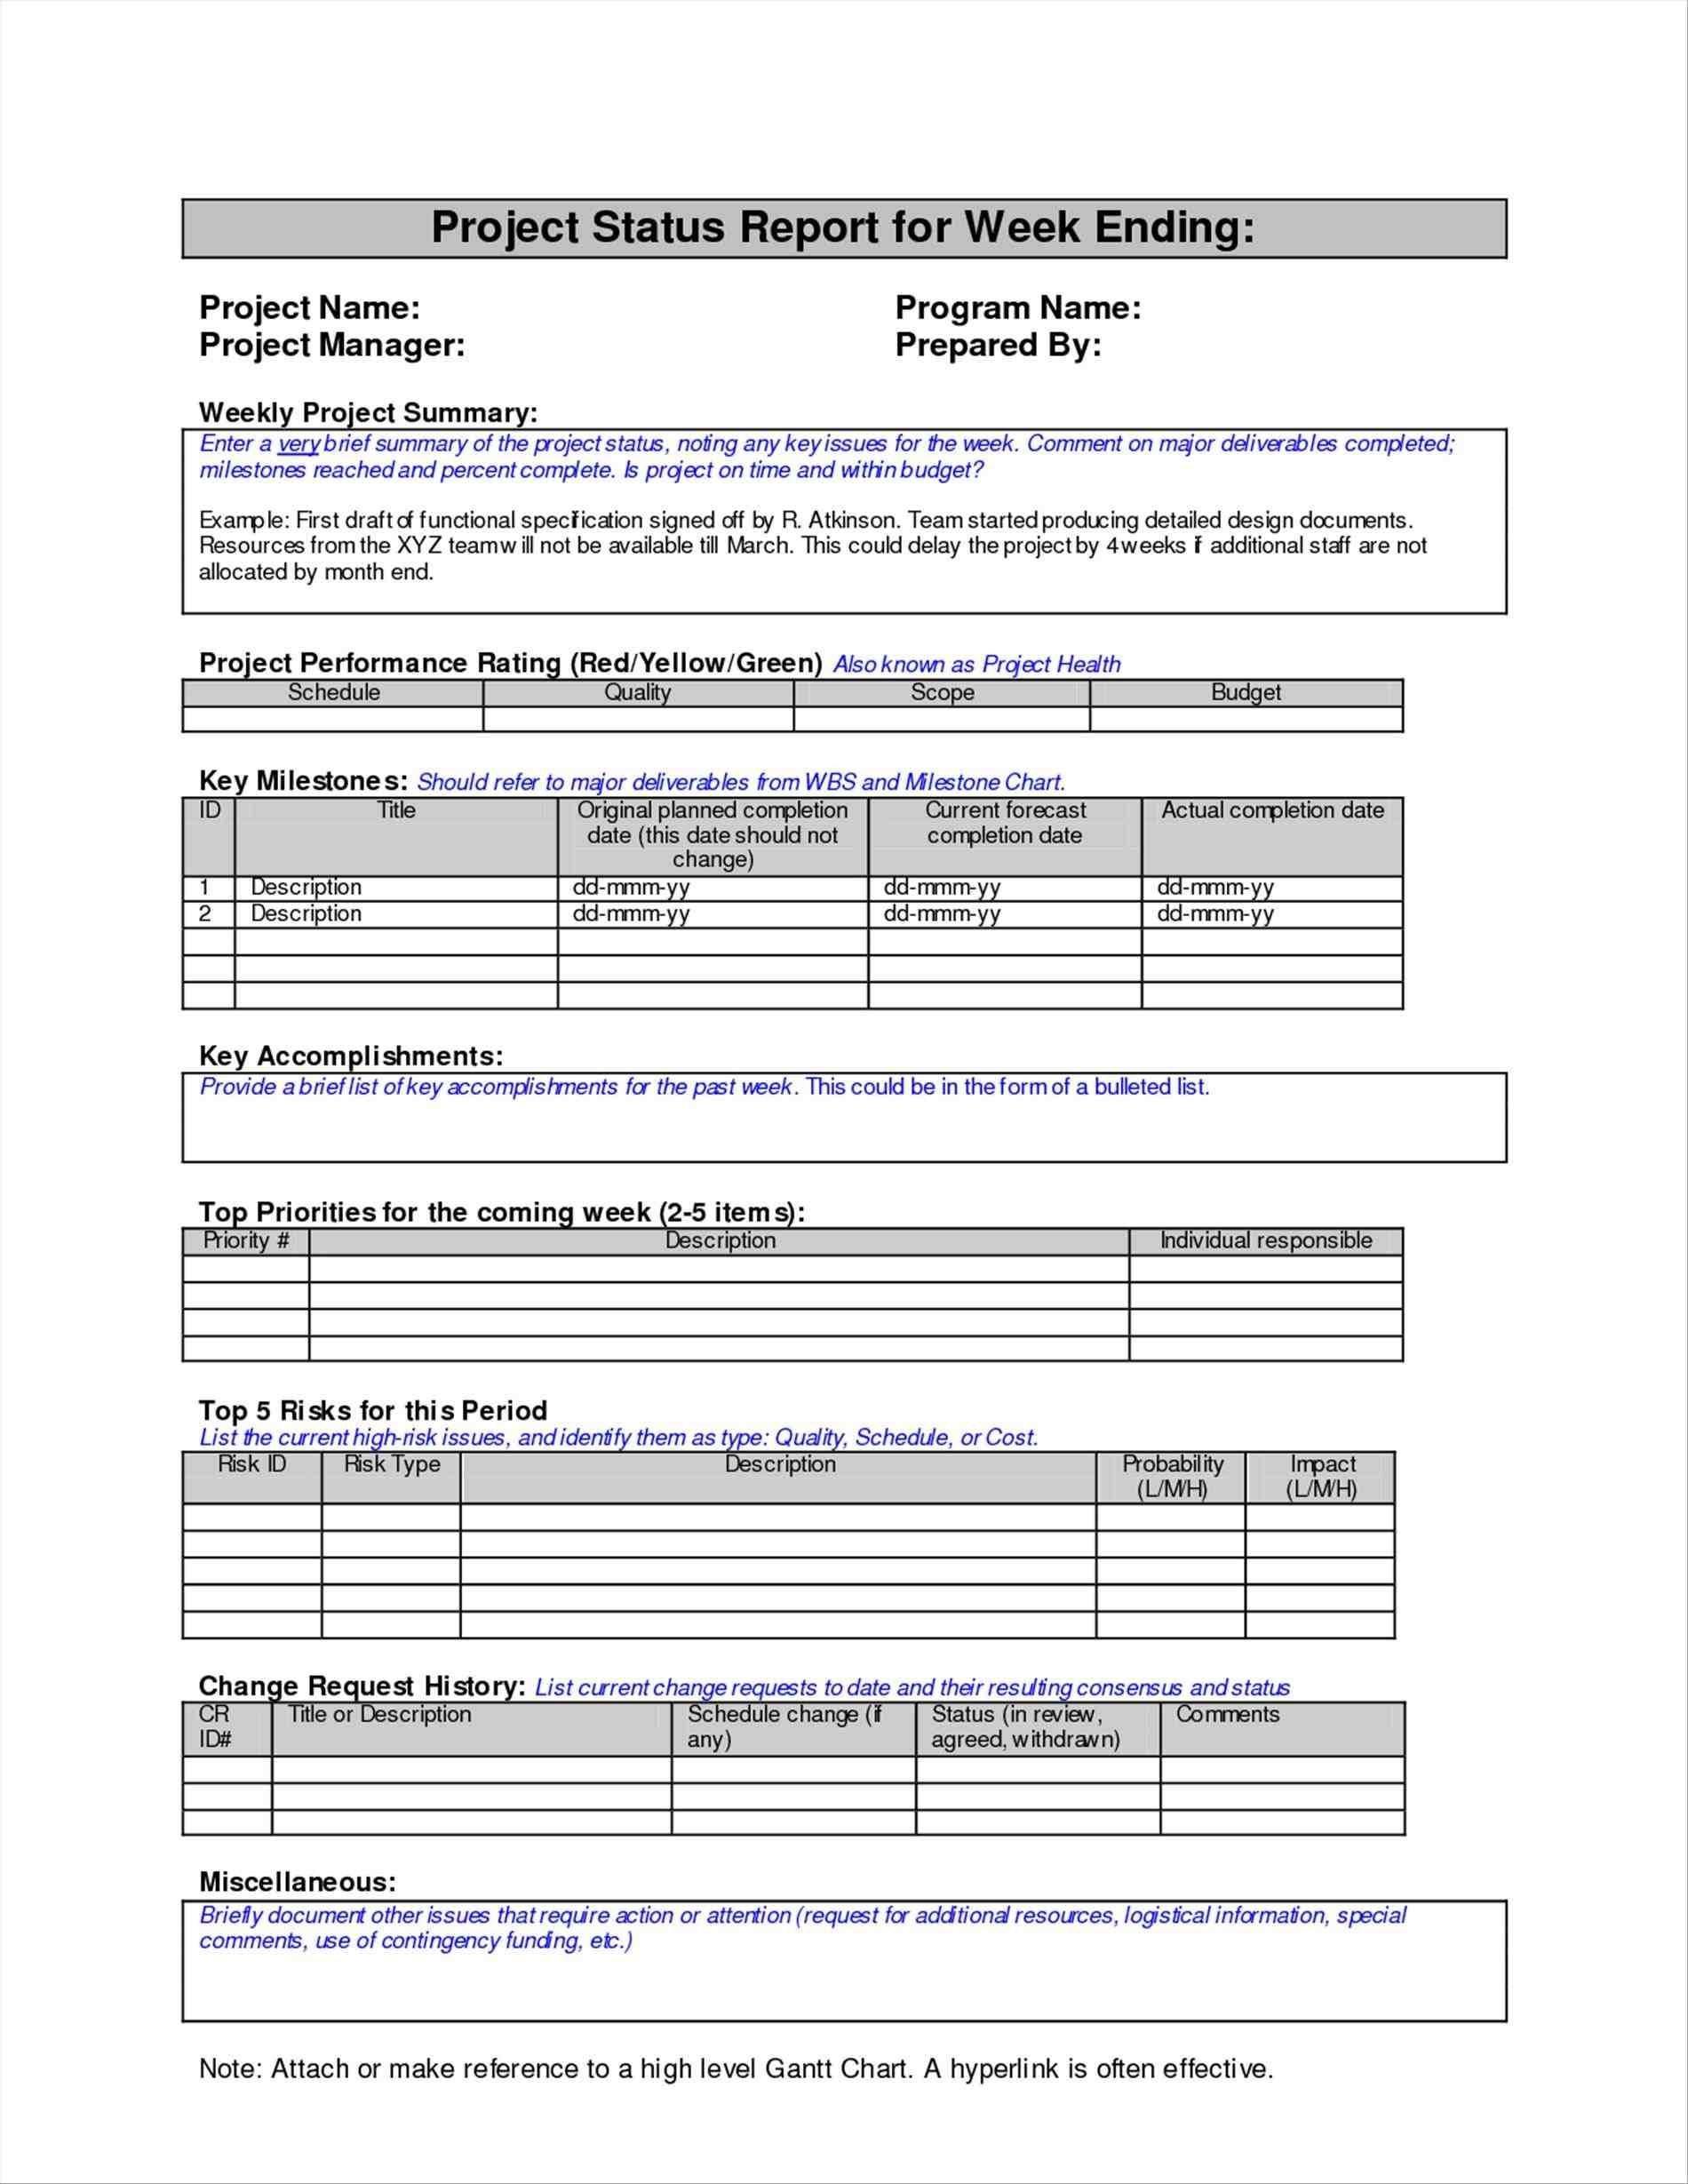 Interior Design Project Timeline  Project Timeline  Project Status Inside Team Progress Report Template